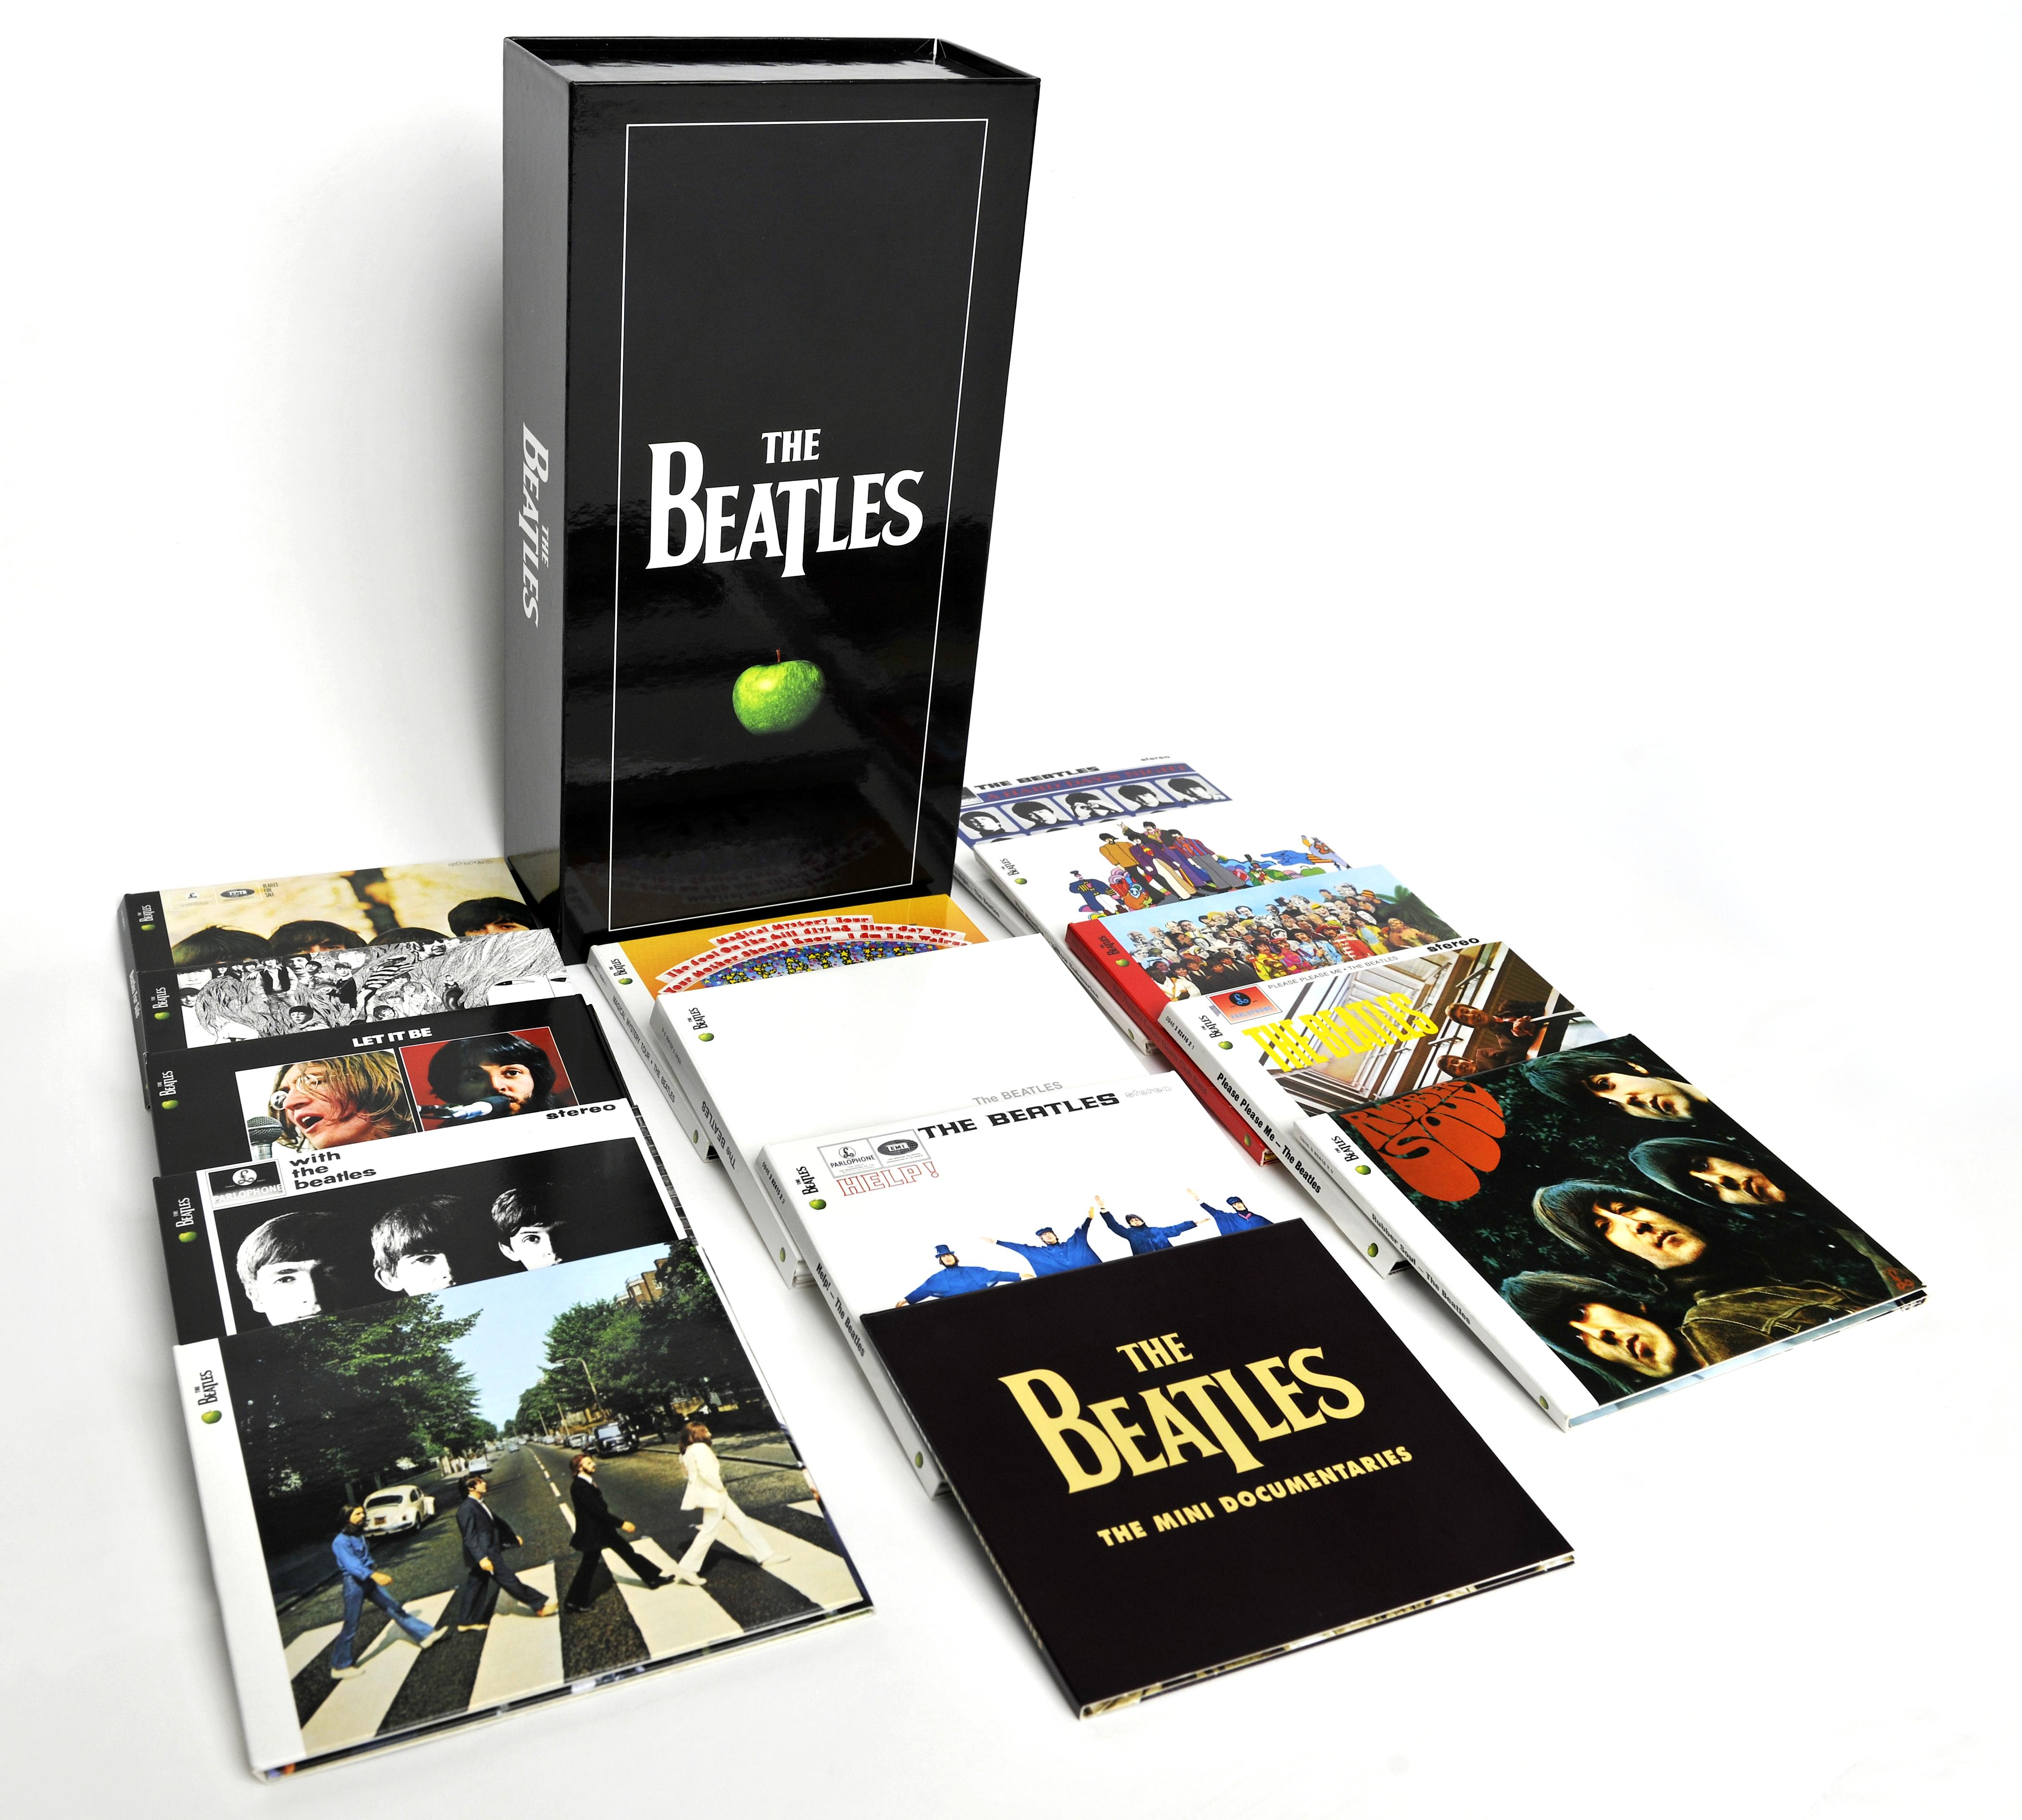 The Beatles Stereo Box Set (2009)